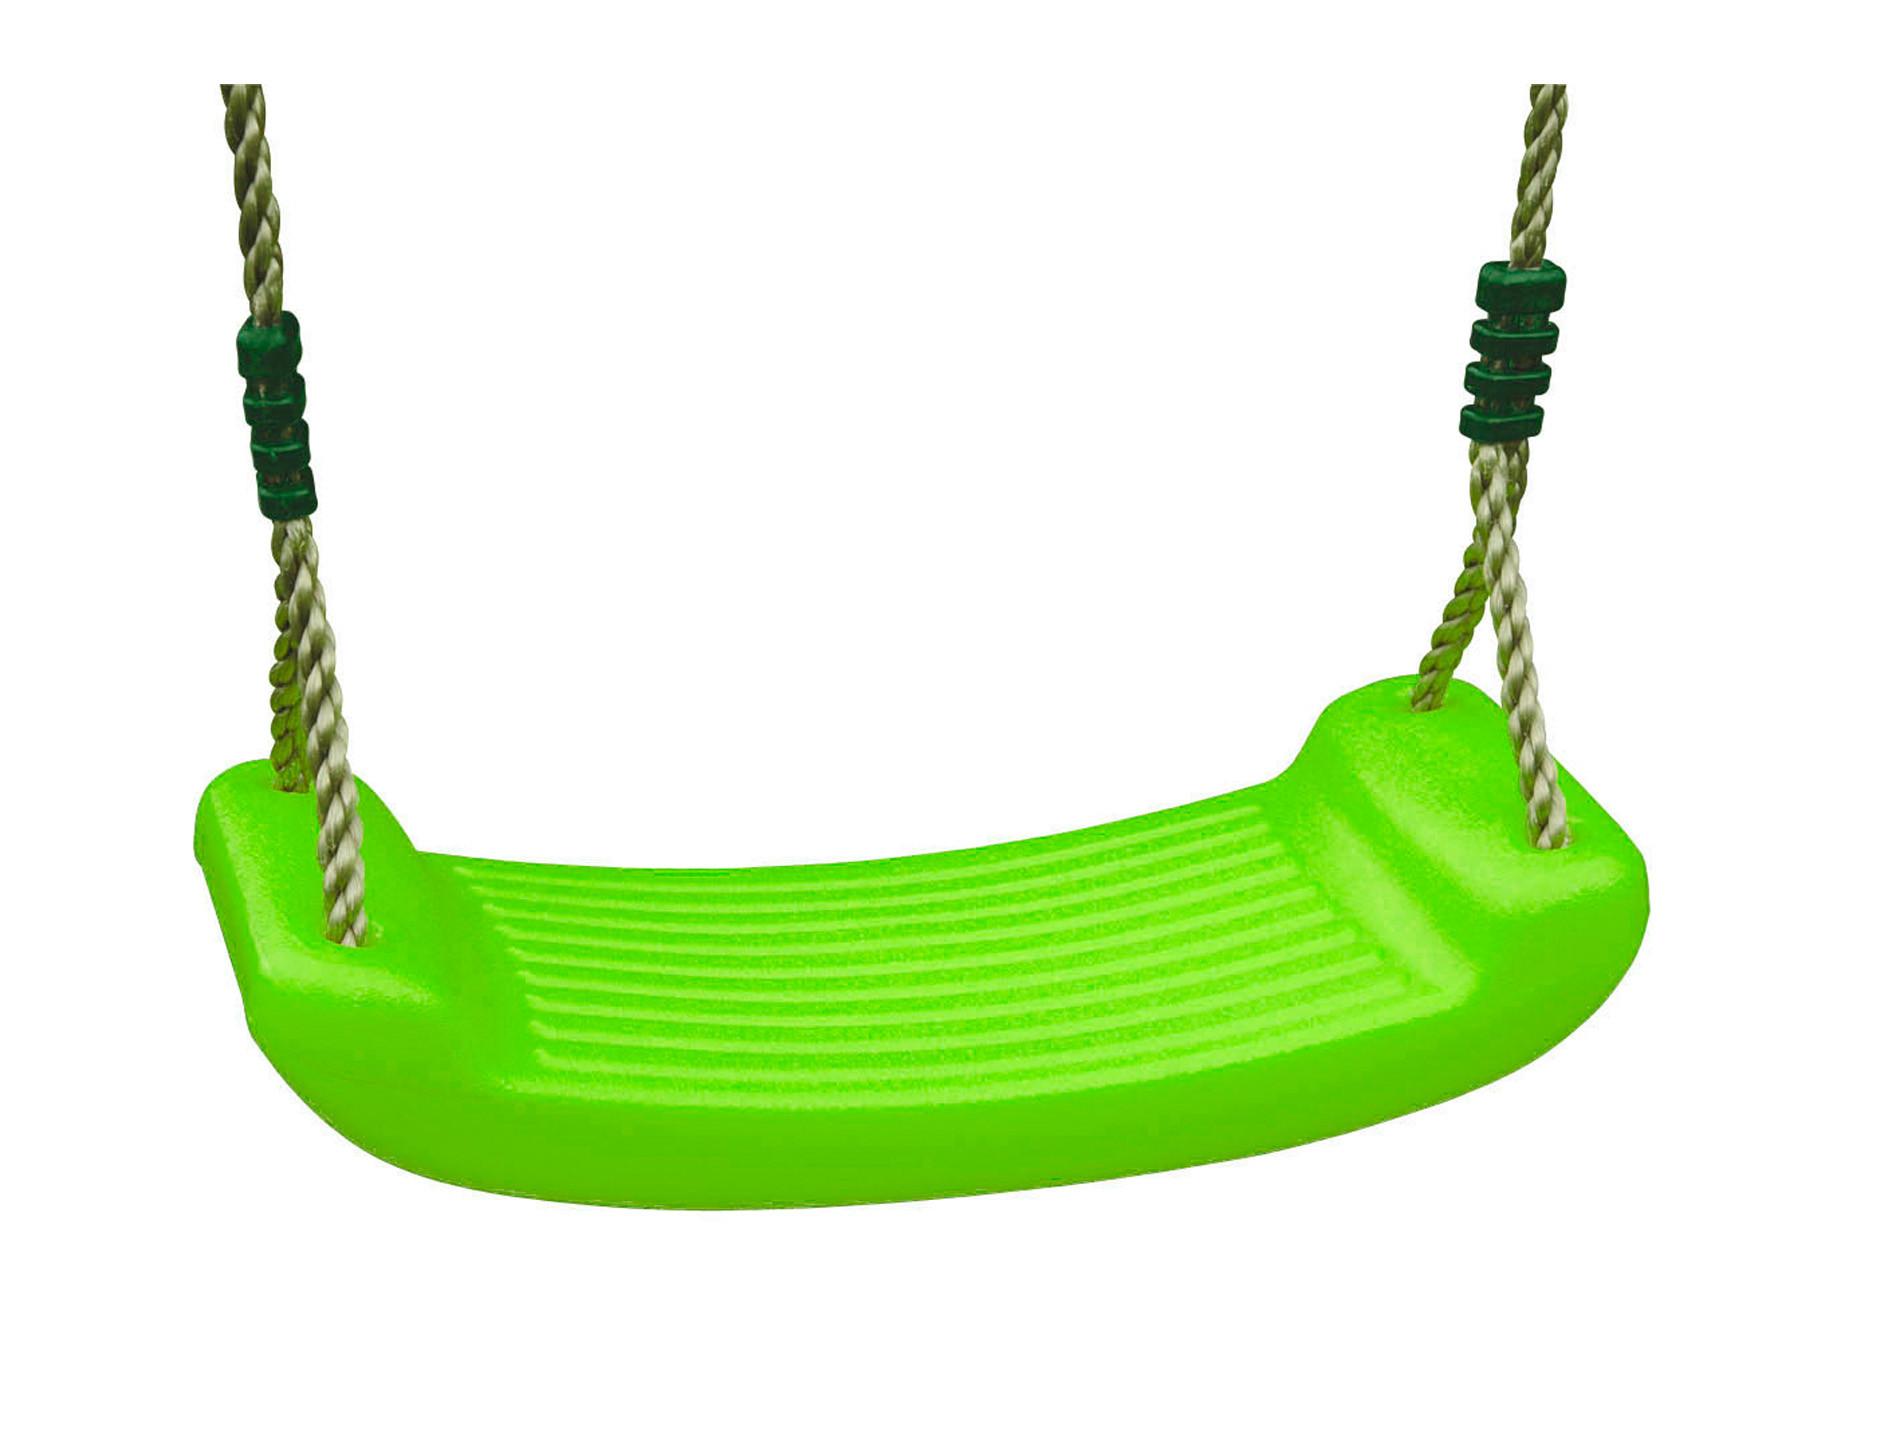 Balançoire en plastique vert 2,50m TRIGANO